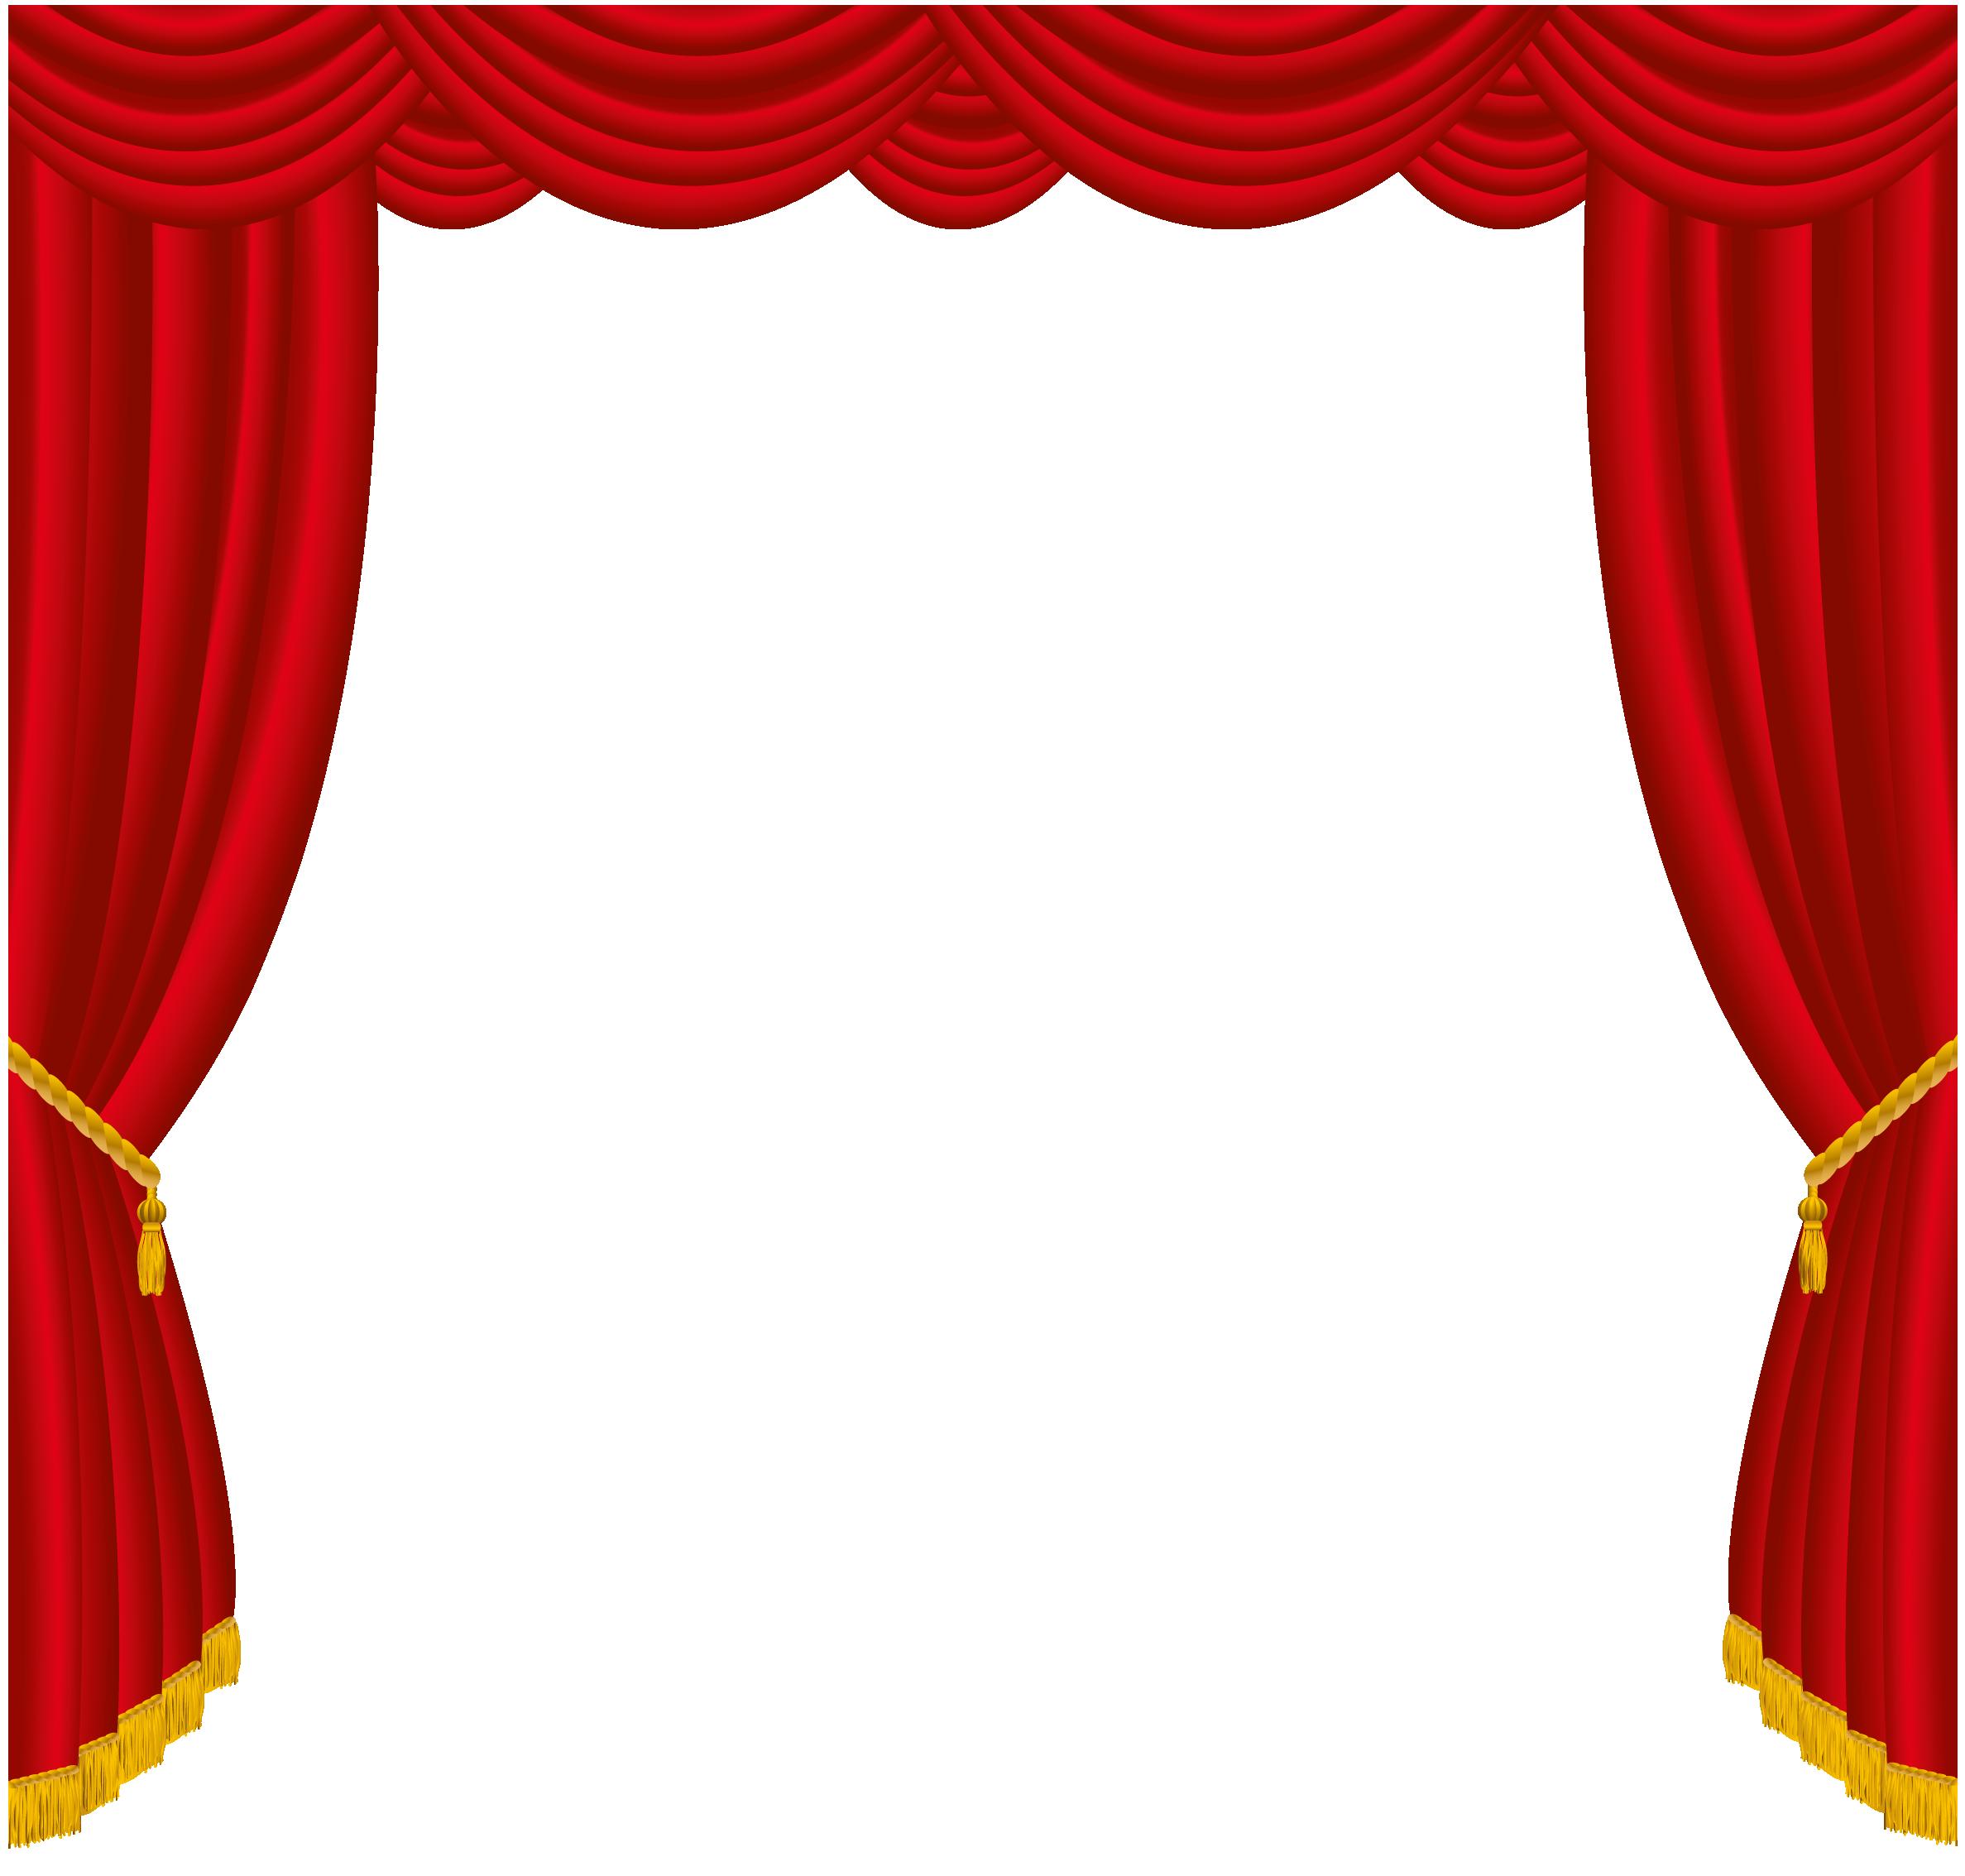 Transparent red decor png. Curtains clipart cartoon